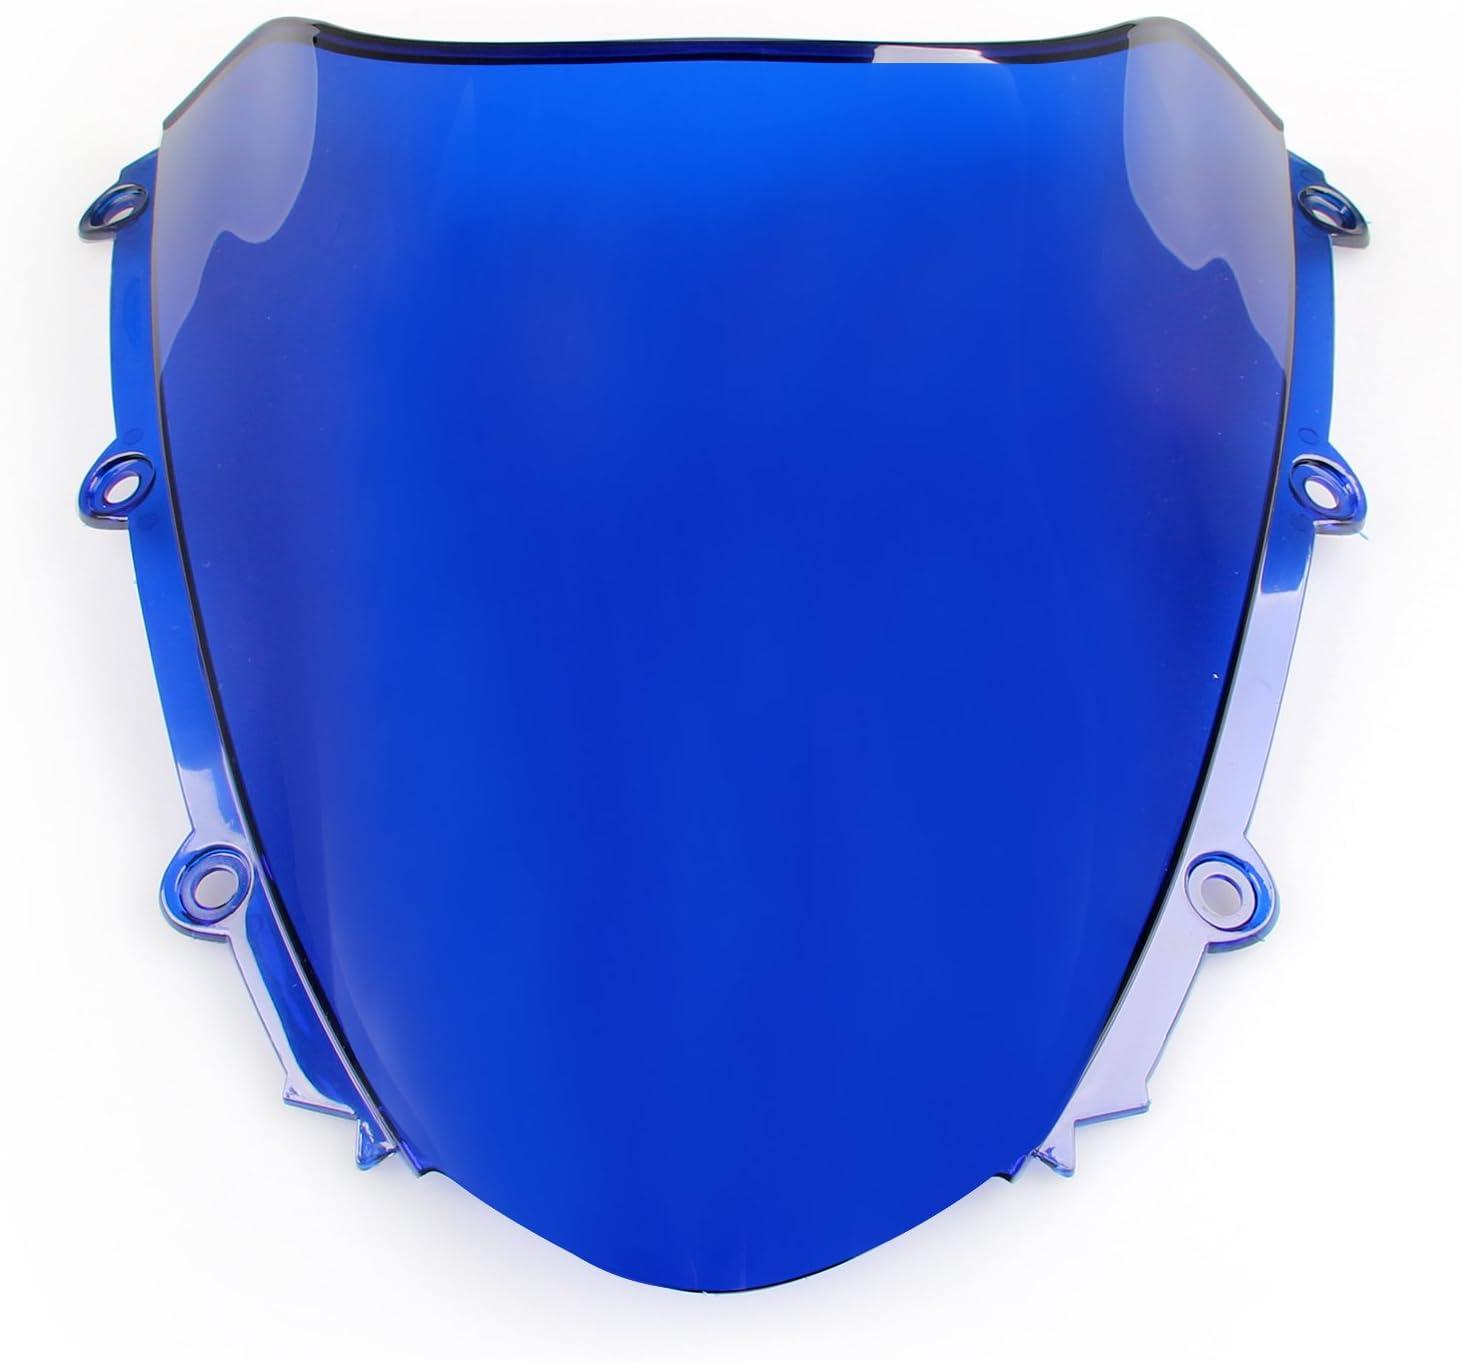 Areyourshop Windshield WindScreen Double Bubble CBR 2 40% OFF Cheap Sale For 1000RR Rare